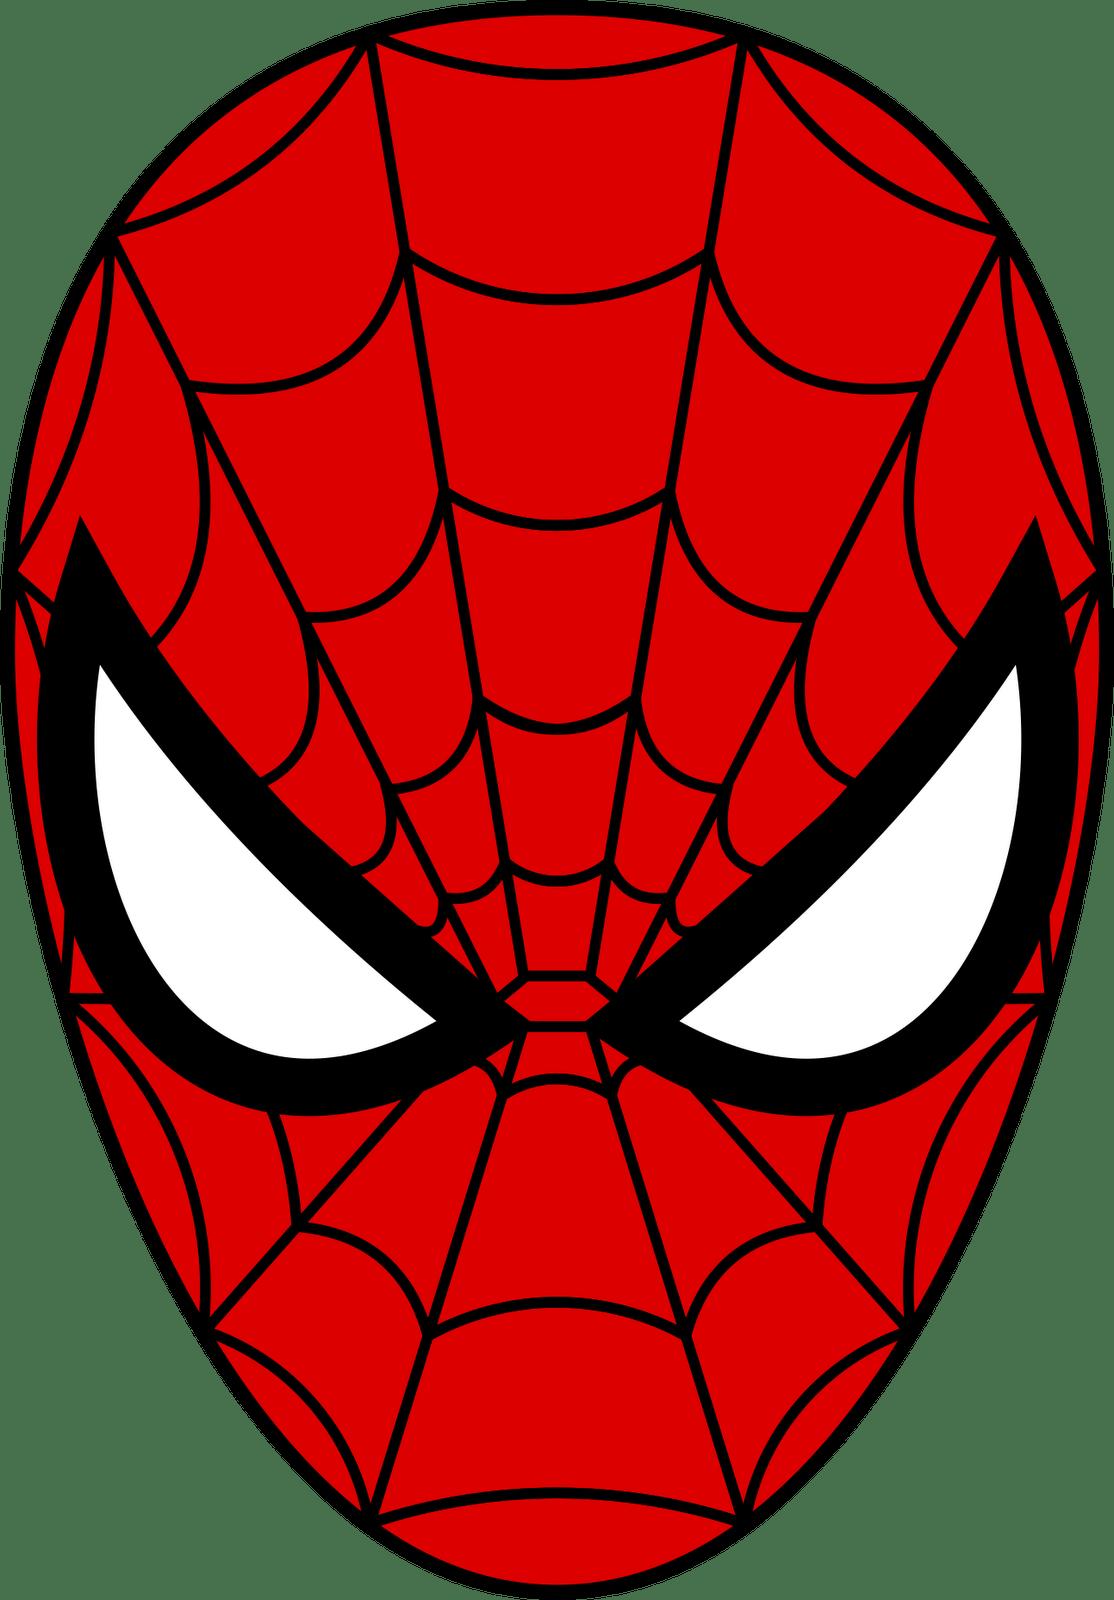 Spider Man Mask From Cardboard Templates NextInvitation